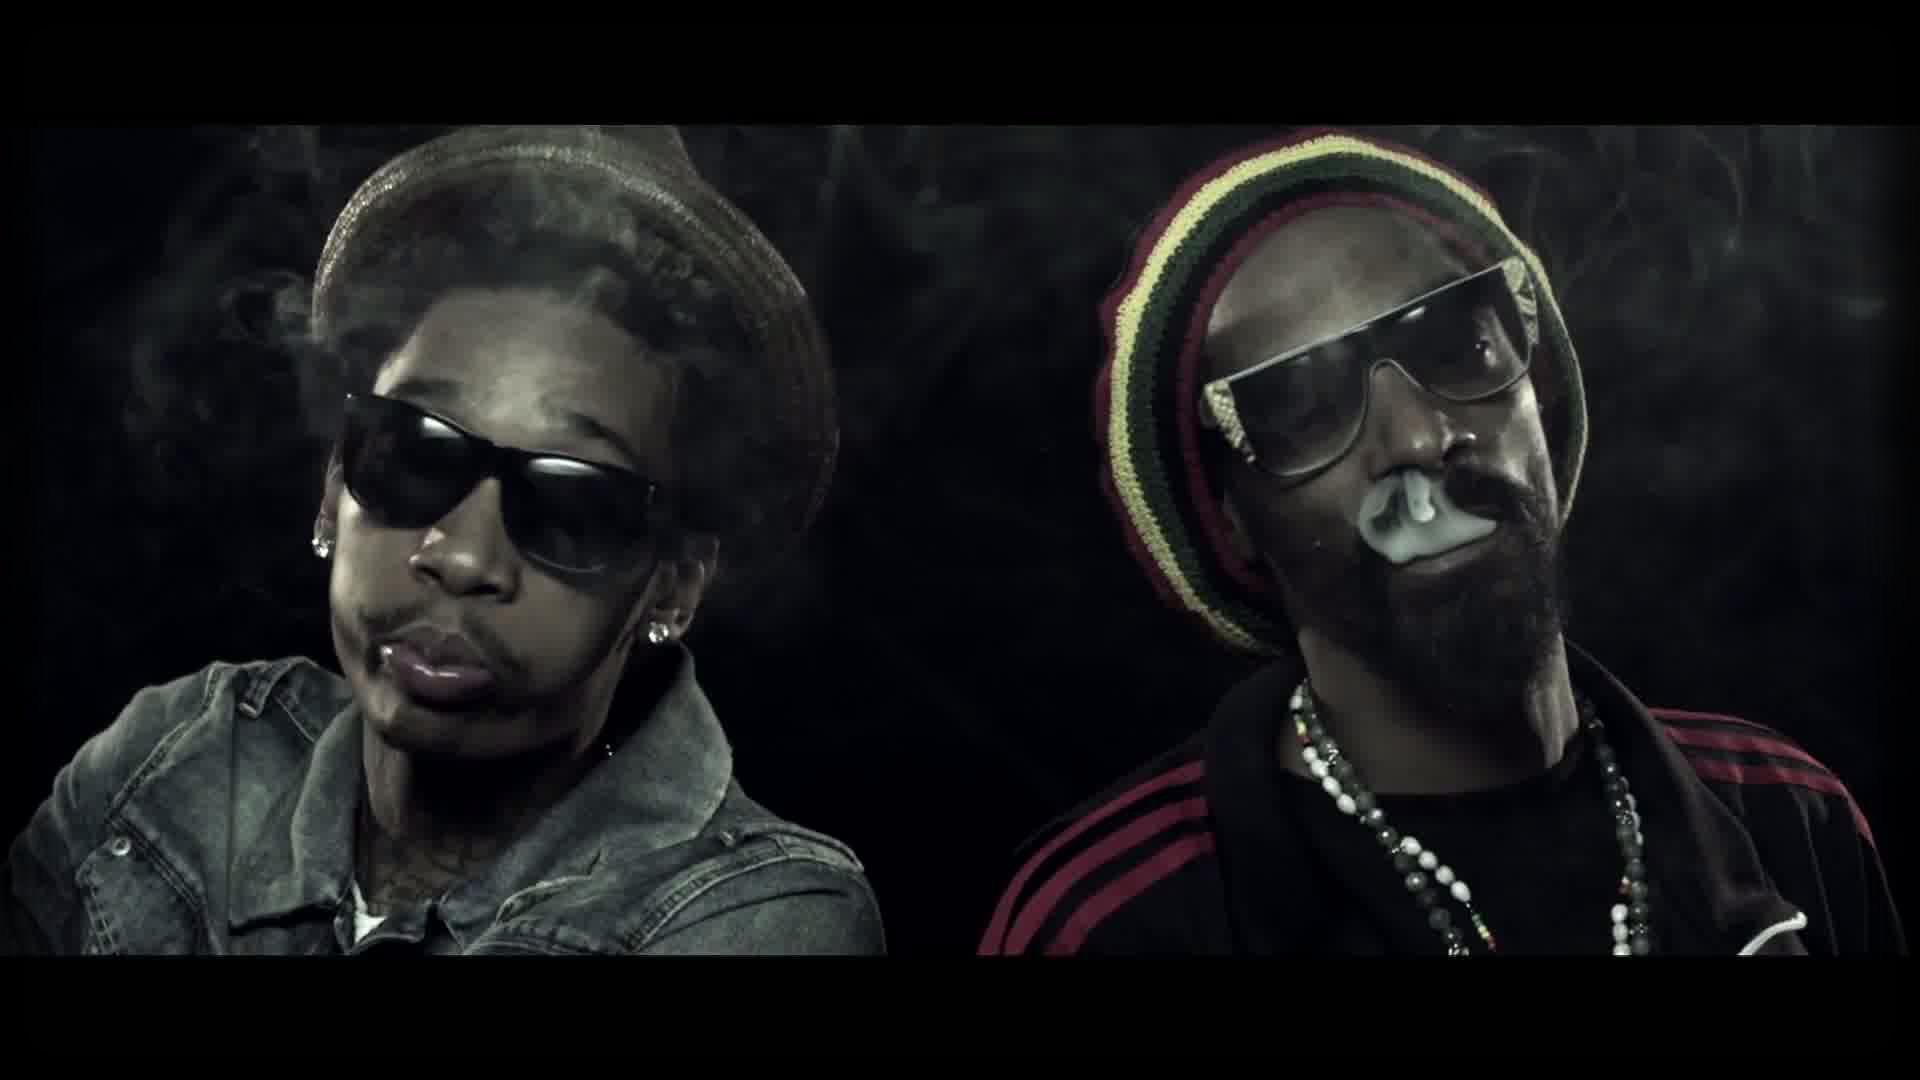 snoop dogg khalifa snoop dogg gangsta hip hop hip hop rap